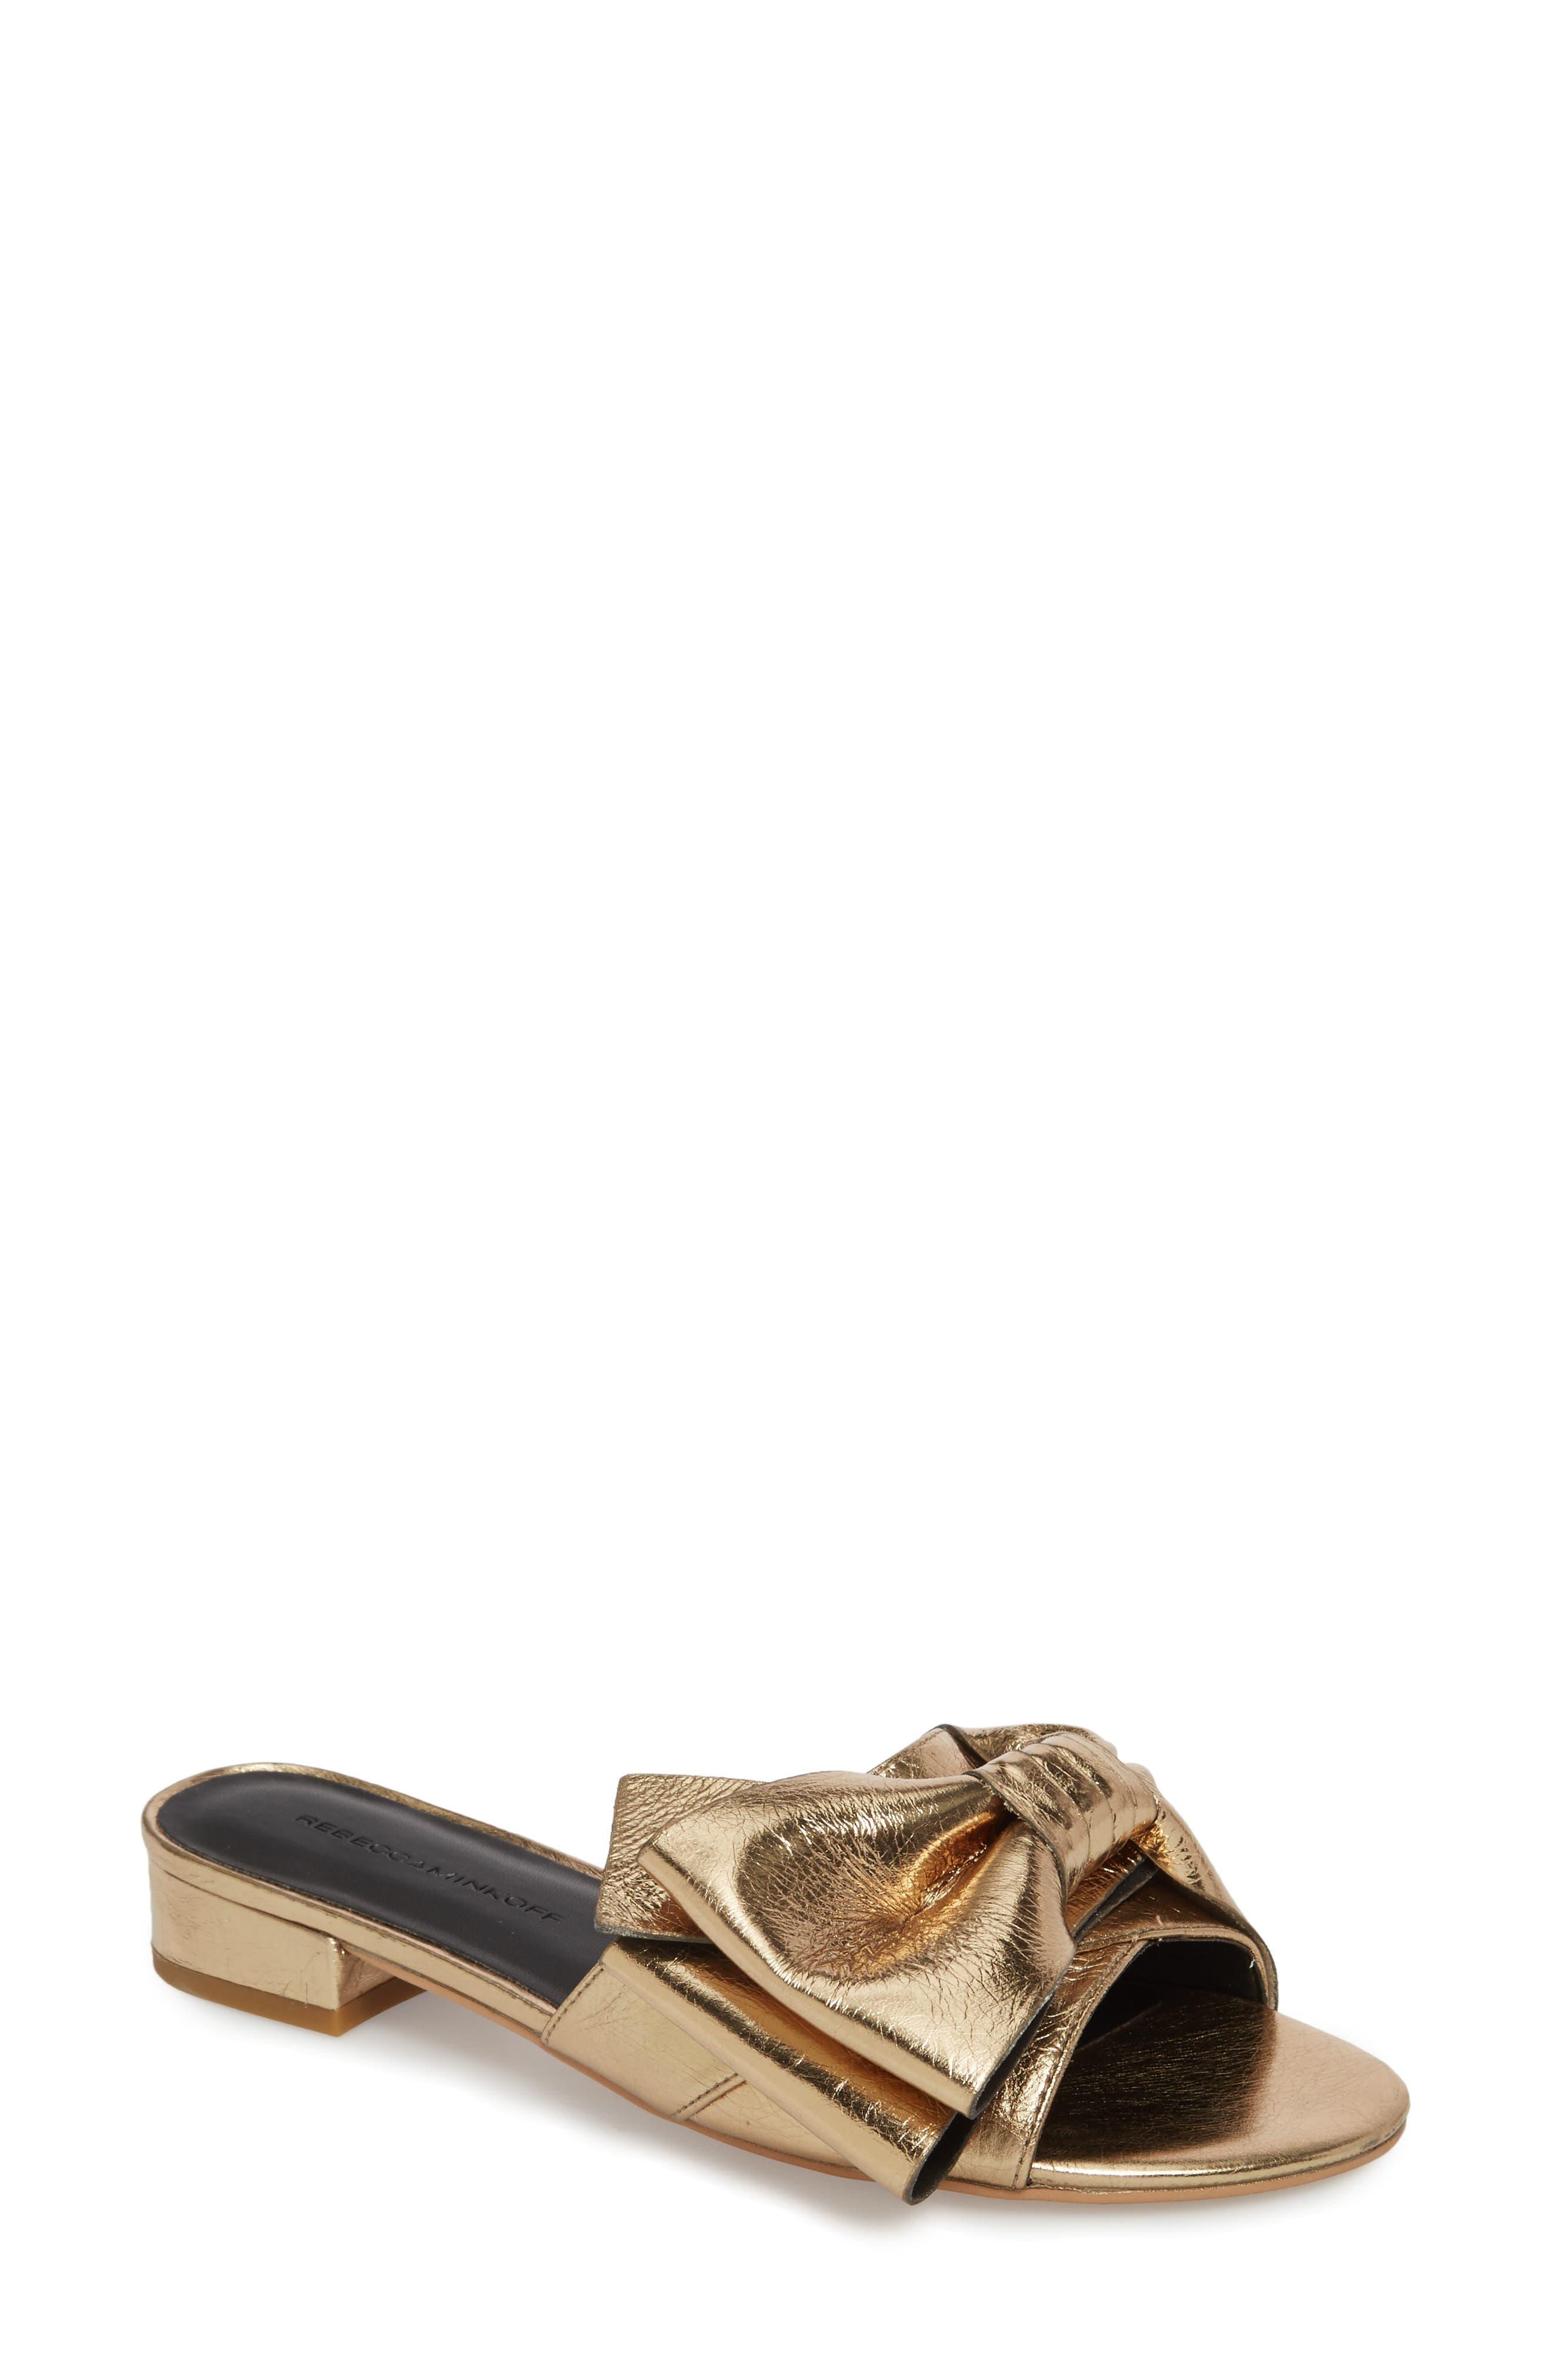 Calista Sandal,                             Main thumbnail 1, color,                             Gold Metallic Leather